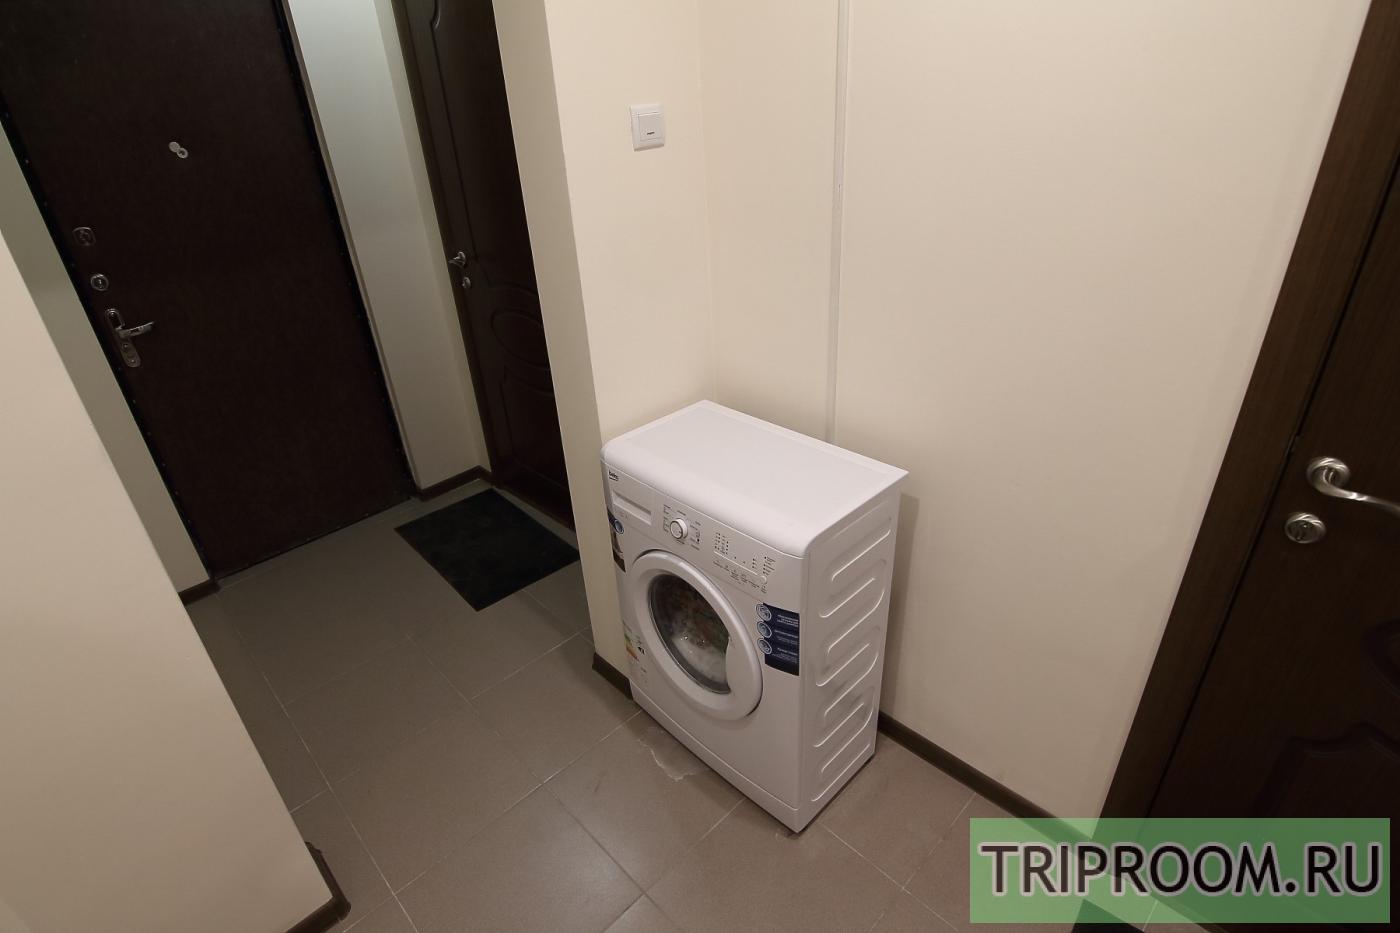 1-комнатная квартира посуточно (вариант № 10582), ул. Романа Брянского улица, фото № 10